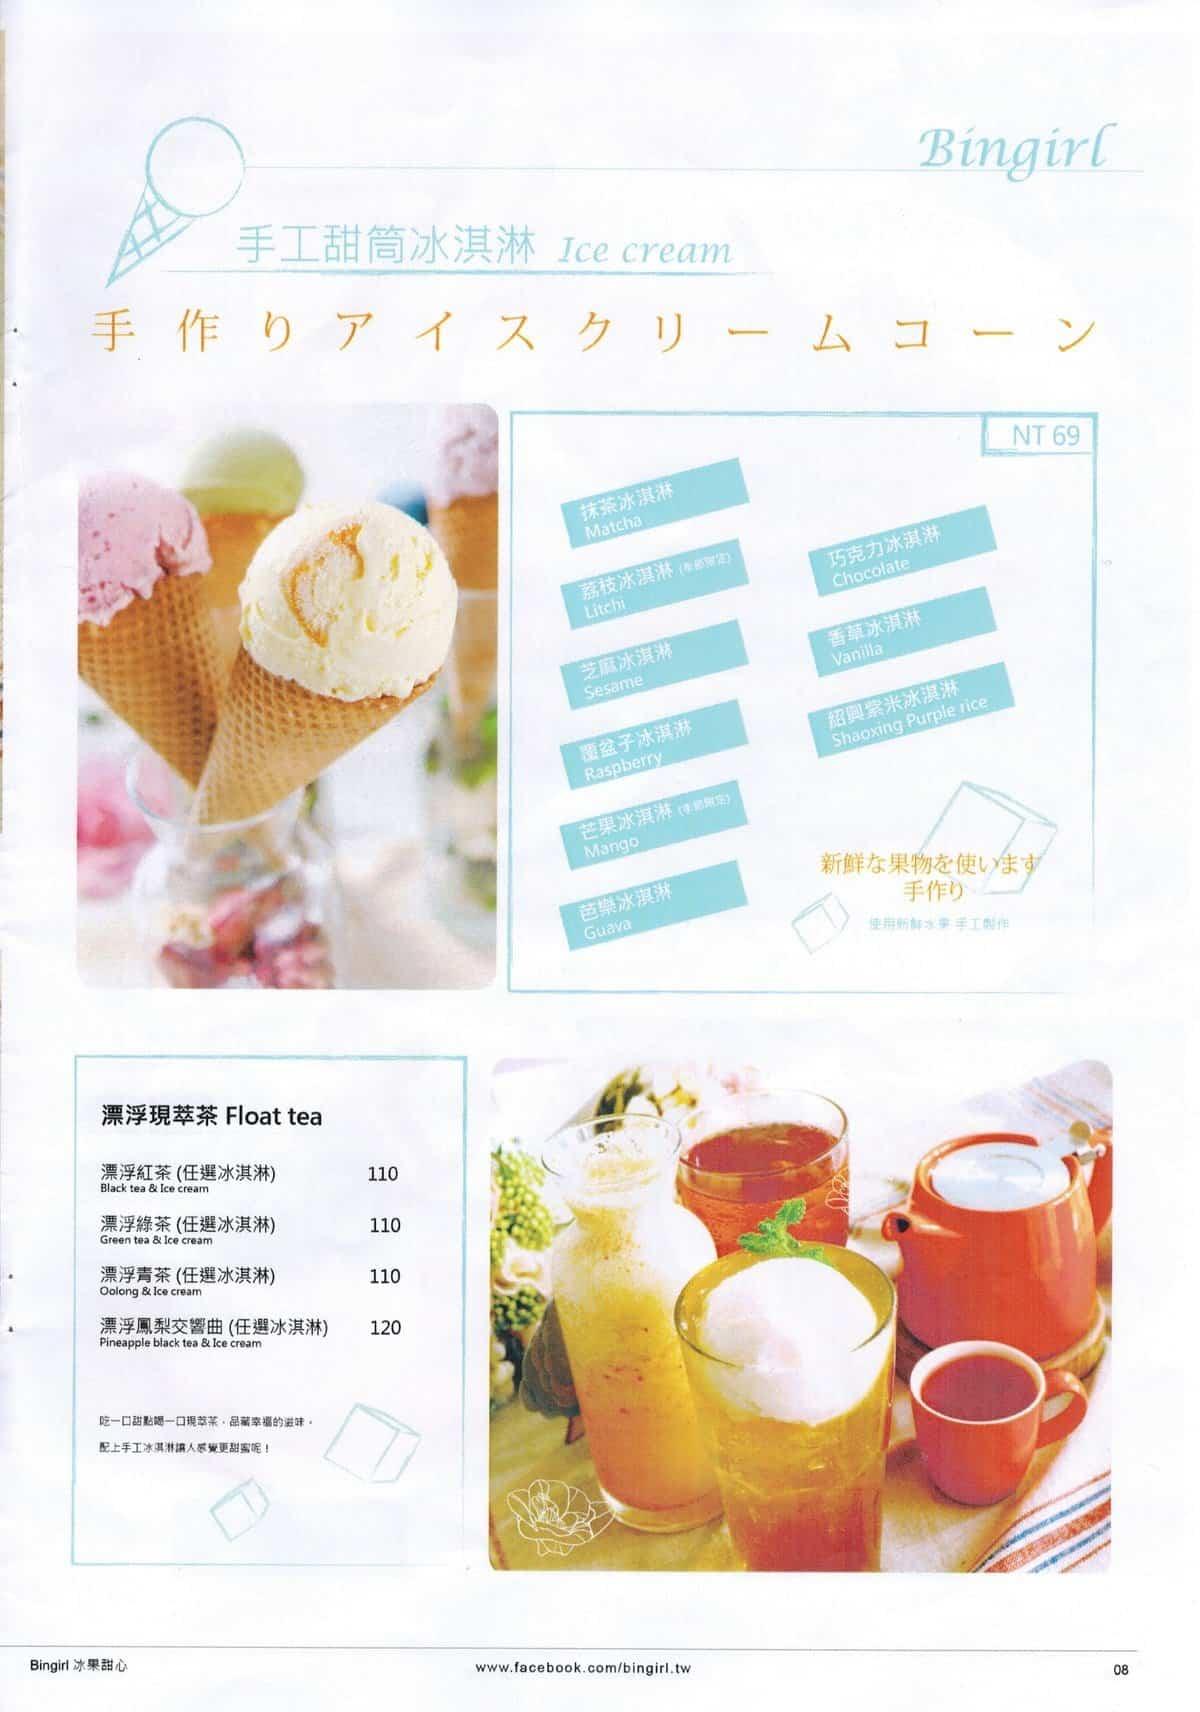 taipei-bingirl-menu9